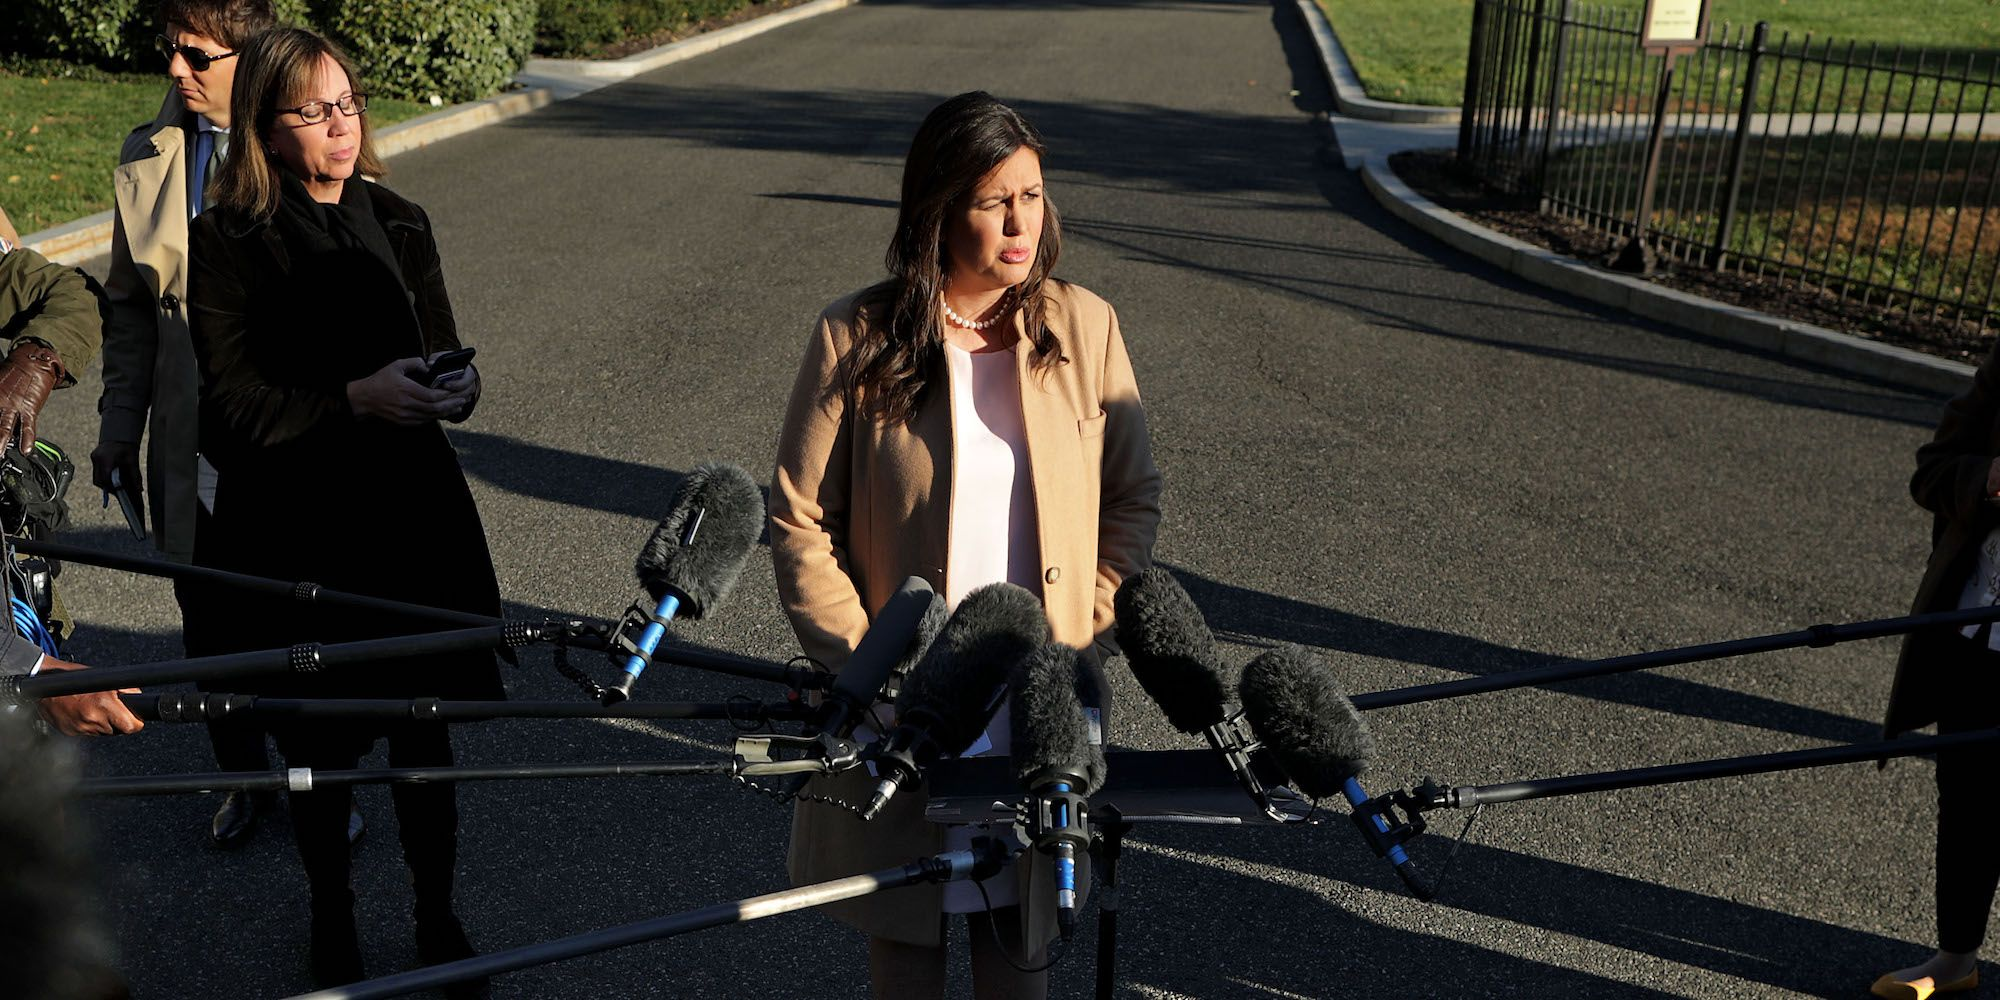 Press Secretary Sarah Sanders Speaks To The Media Outside The White House